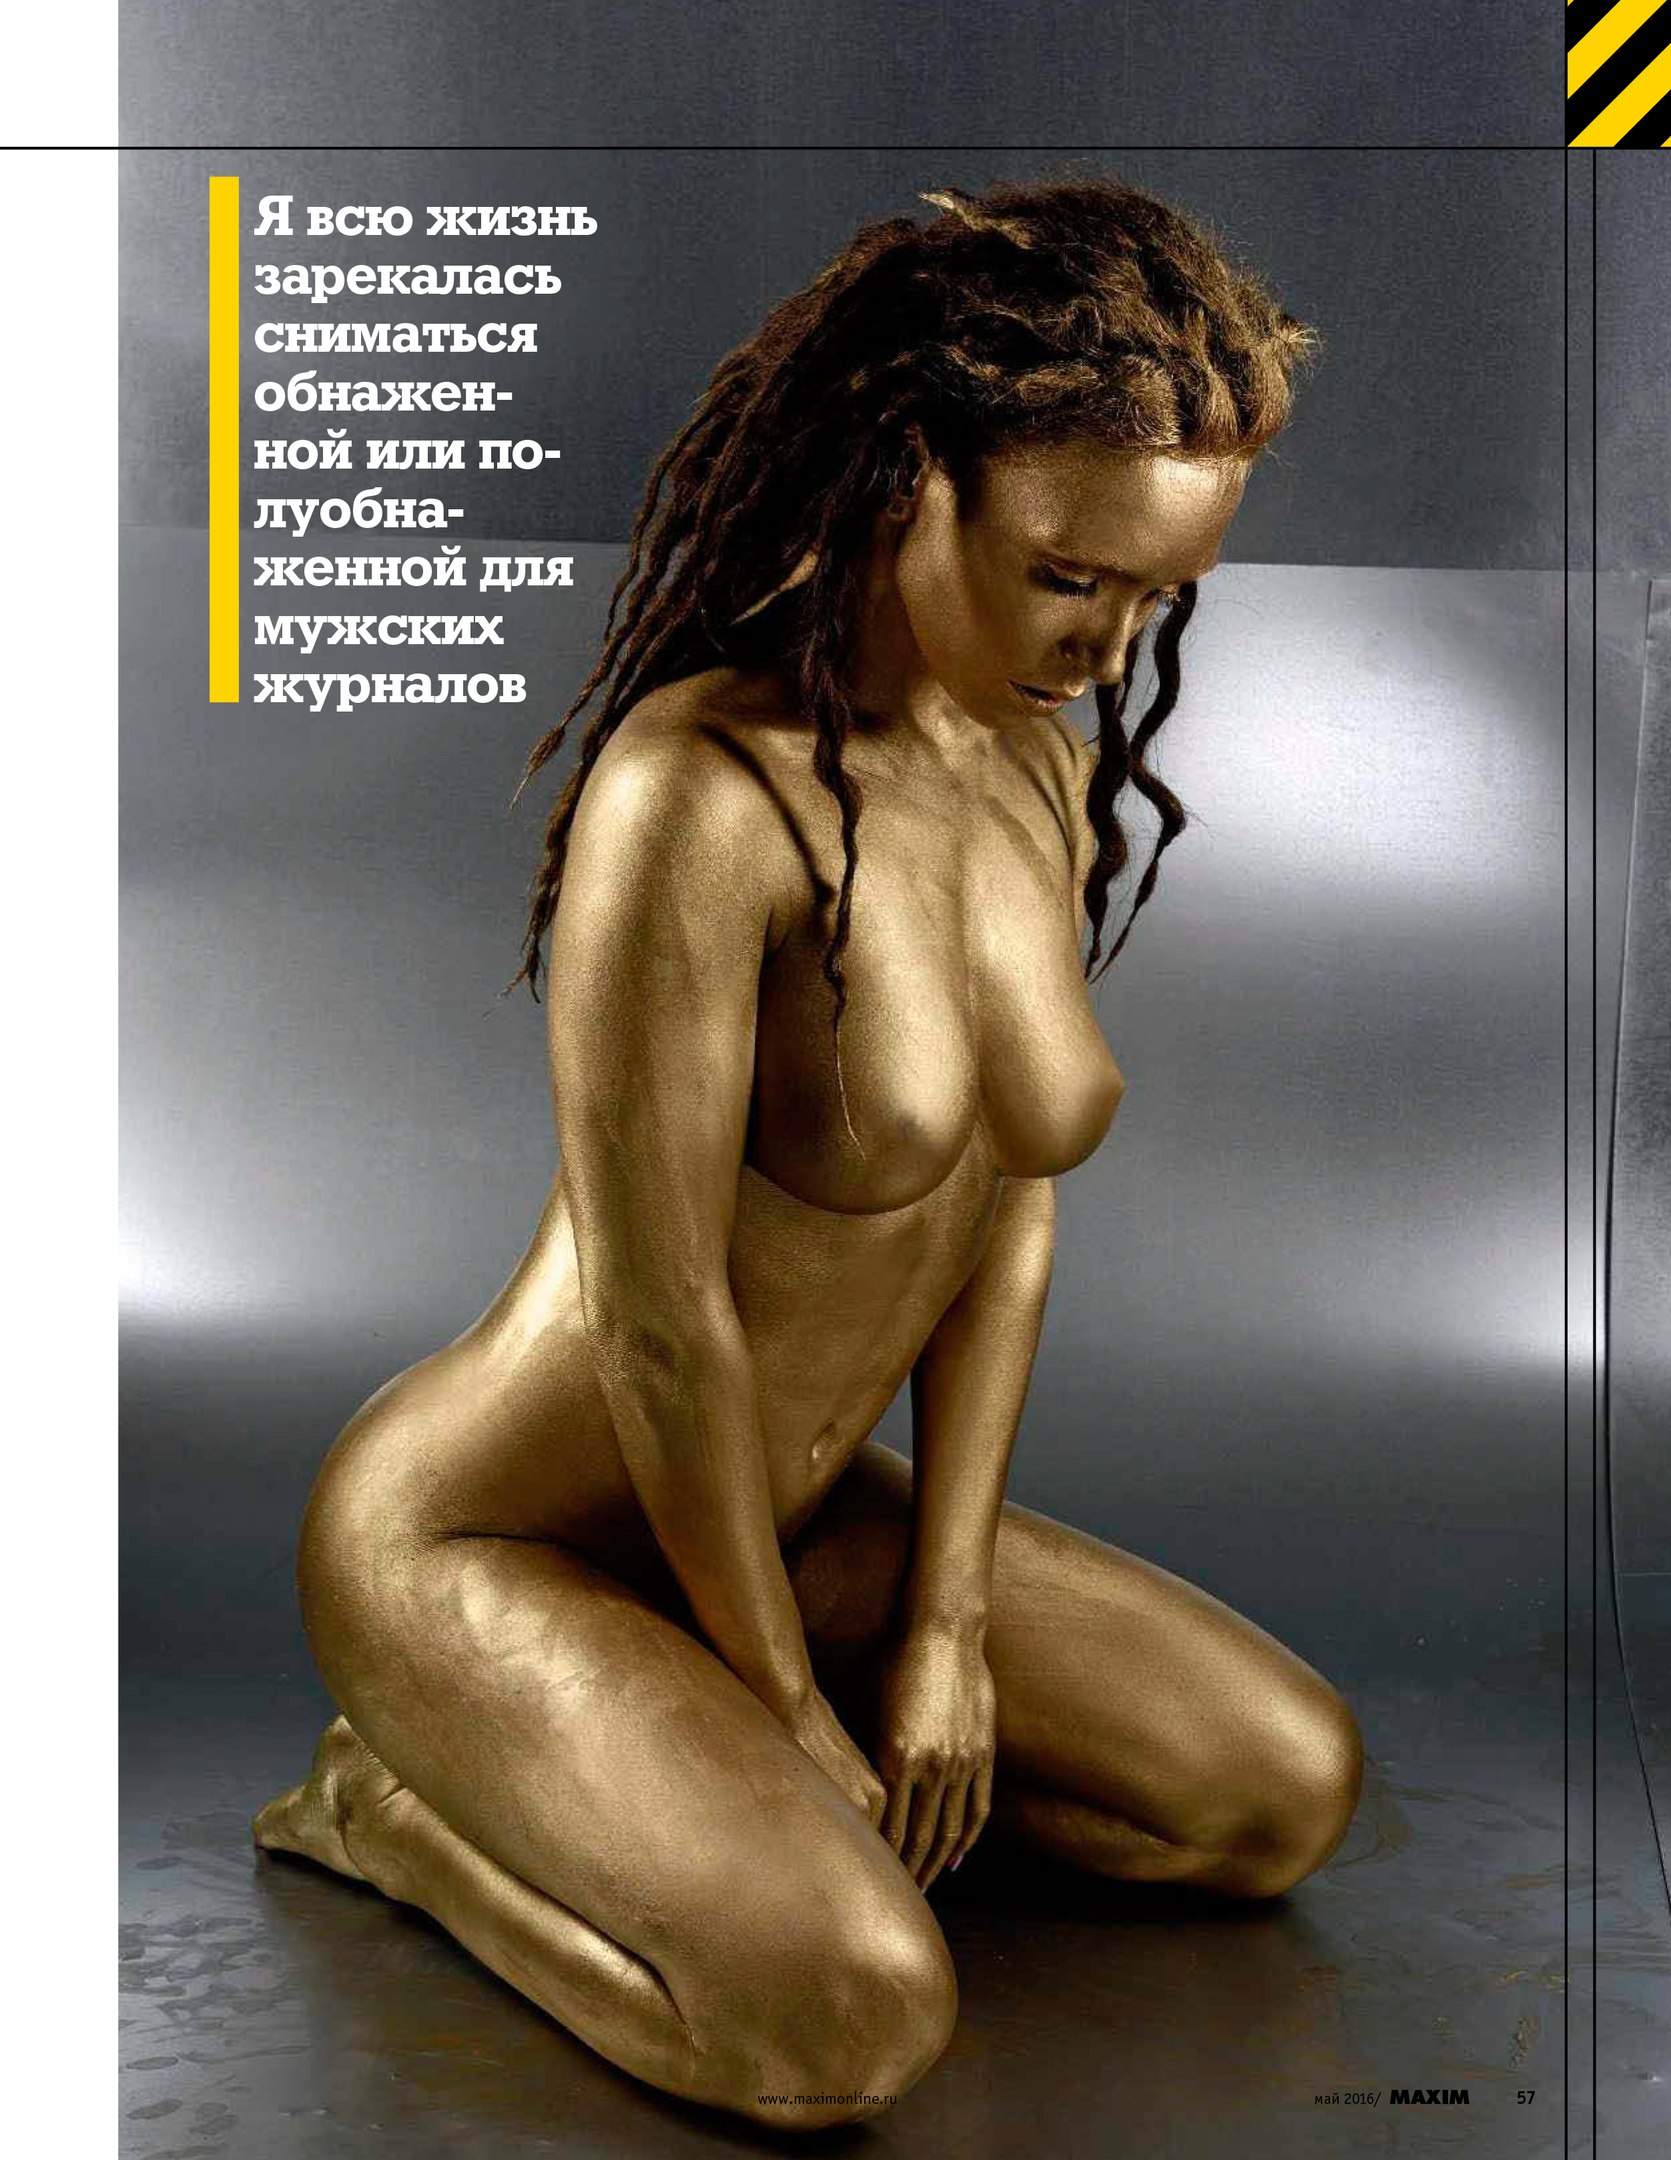 Polina favorskaya nude the same